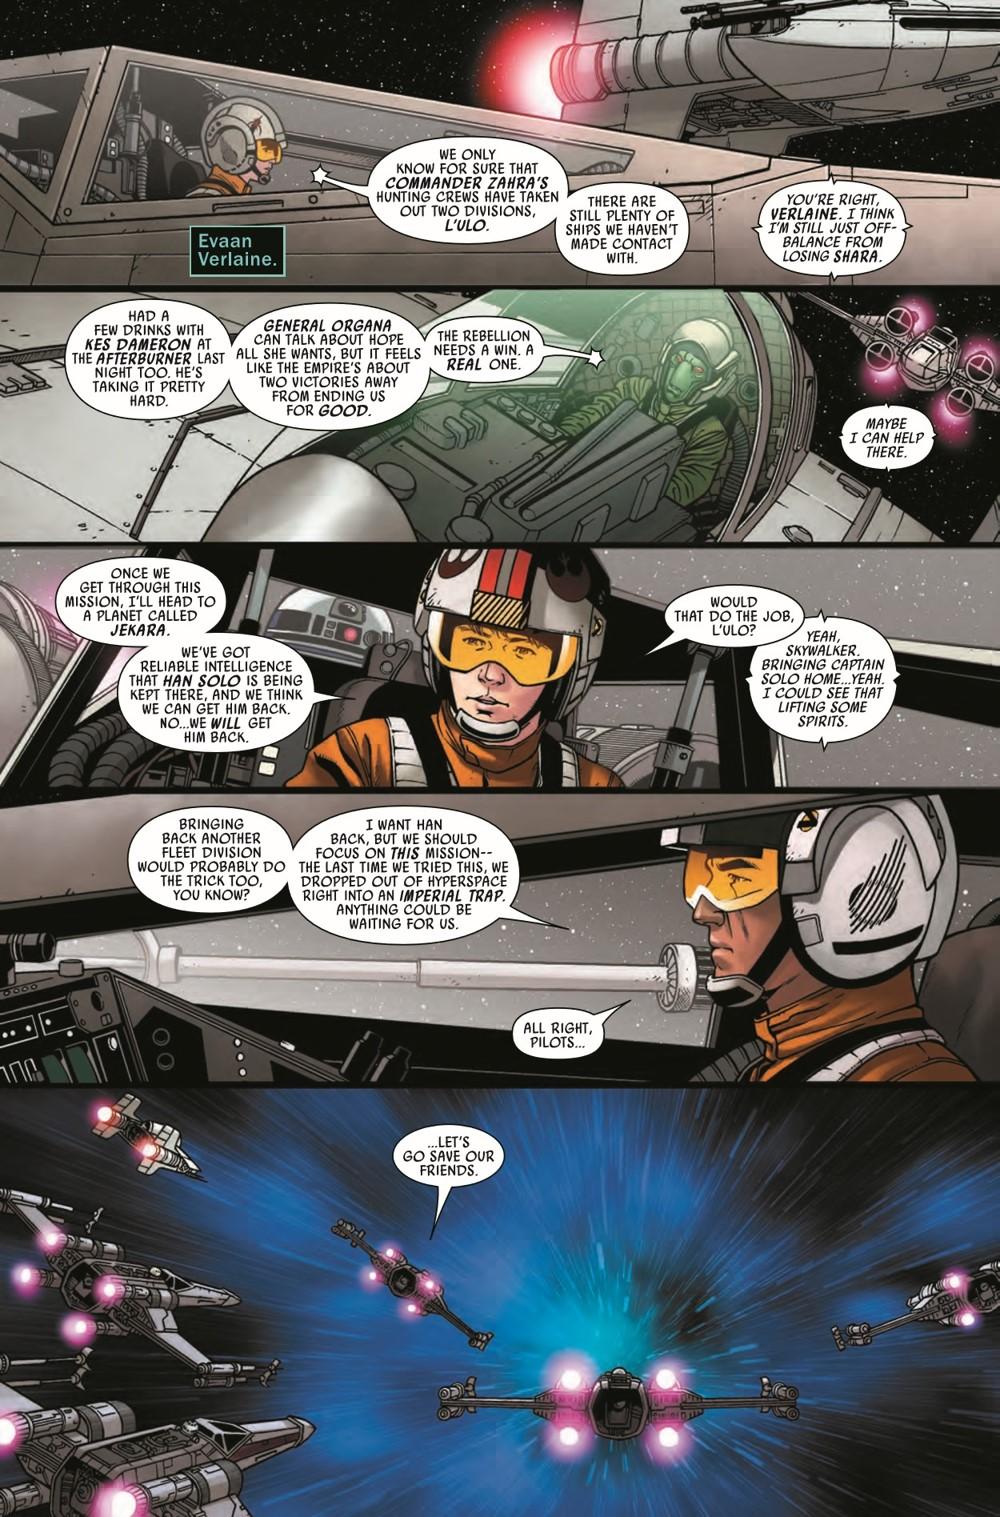 STWARS2020015_Preview-4-1 ComicList Previews: STAR WARS #15